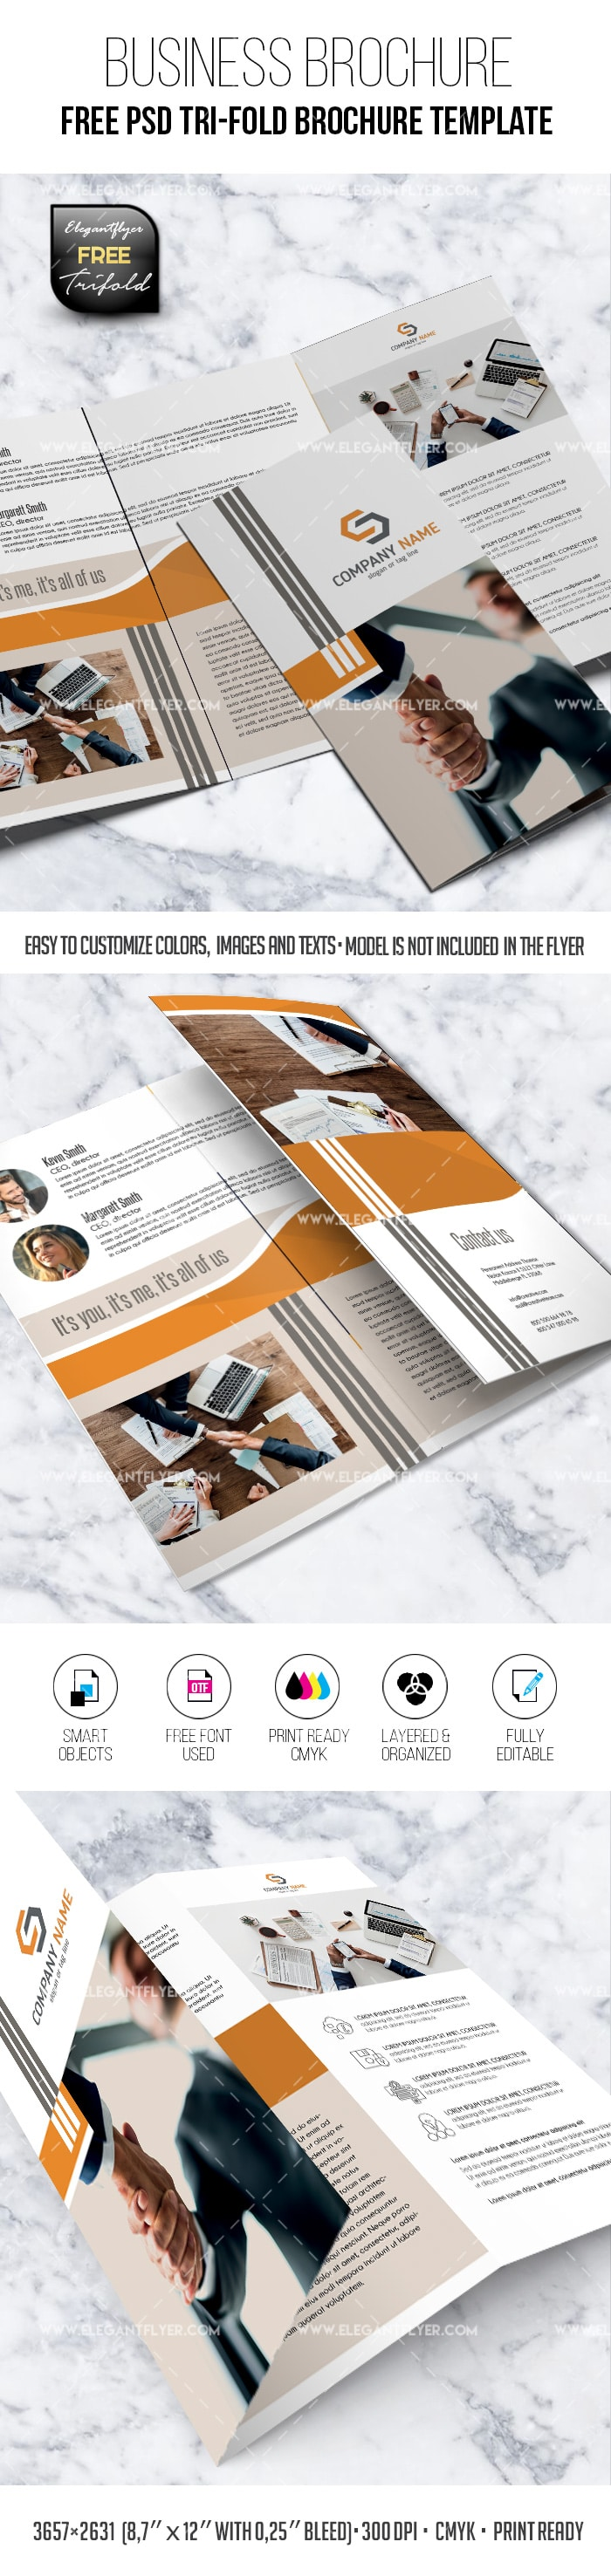 Free A4 tri-fold business brochure in PSD mockup